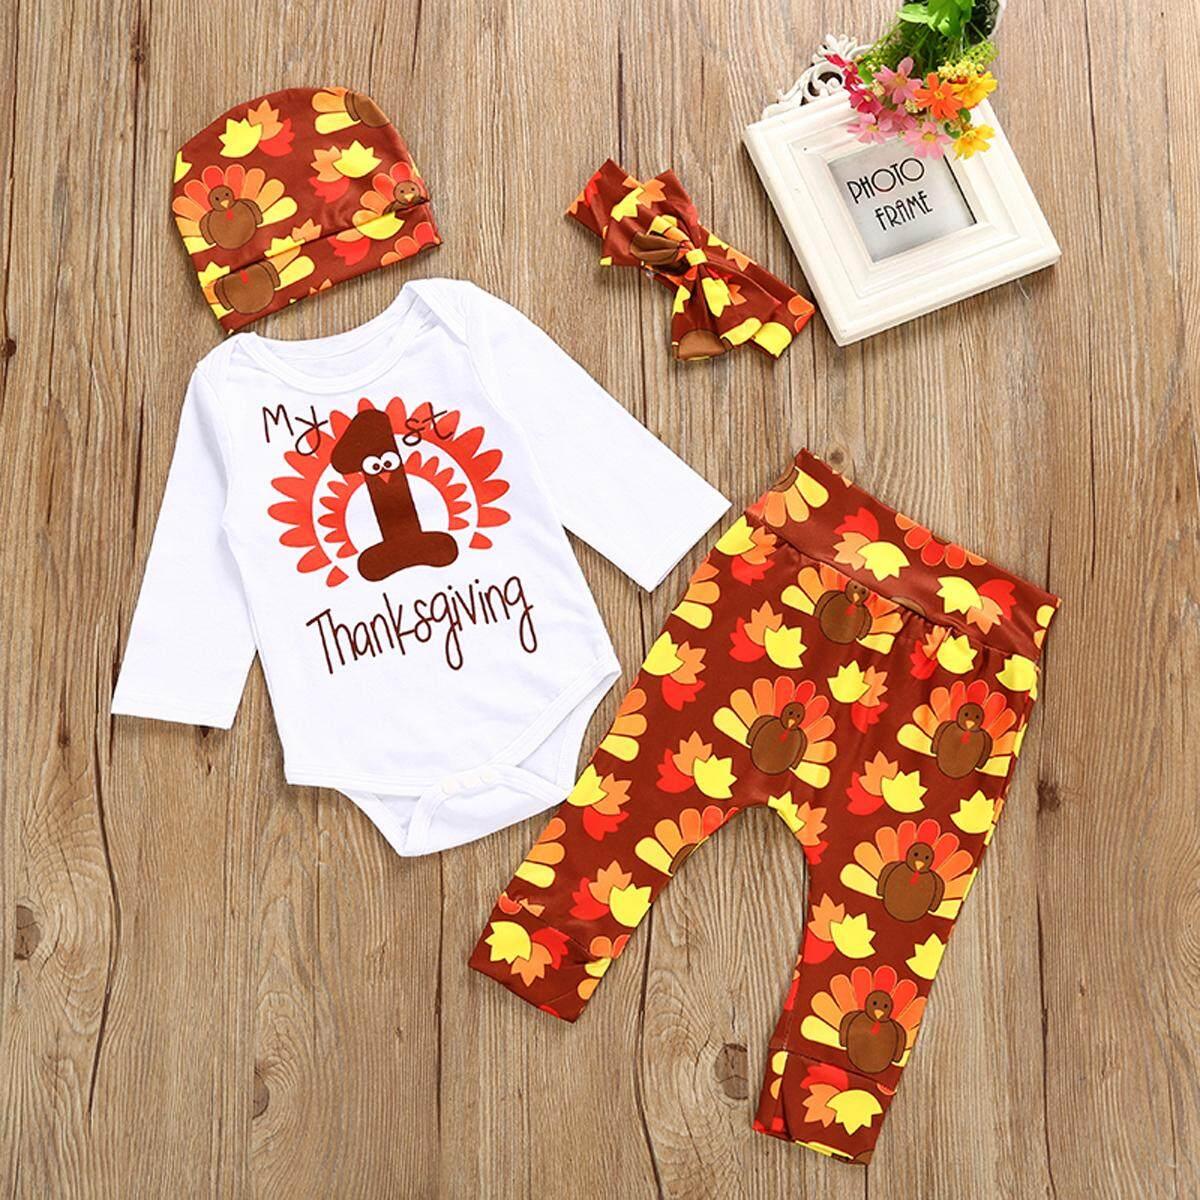 a0f702bad443 2019 4PCS set Infant Baby Thanksgiving Day Turkey Romper+Pants+Hat+Headband